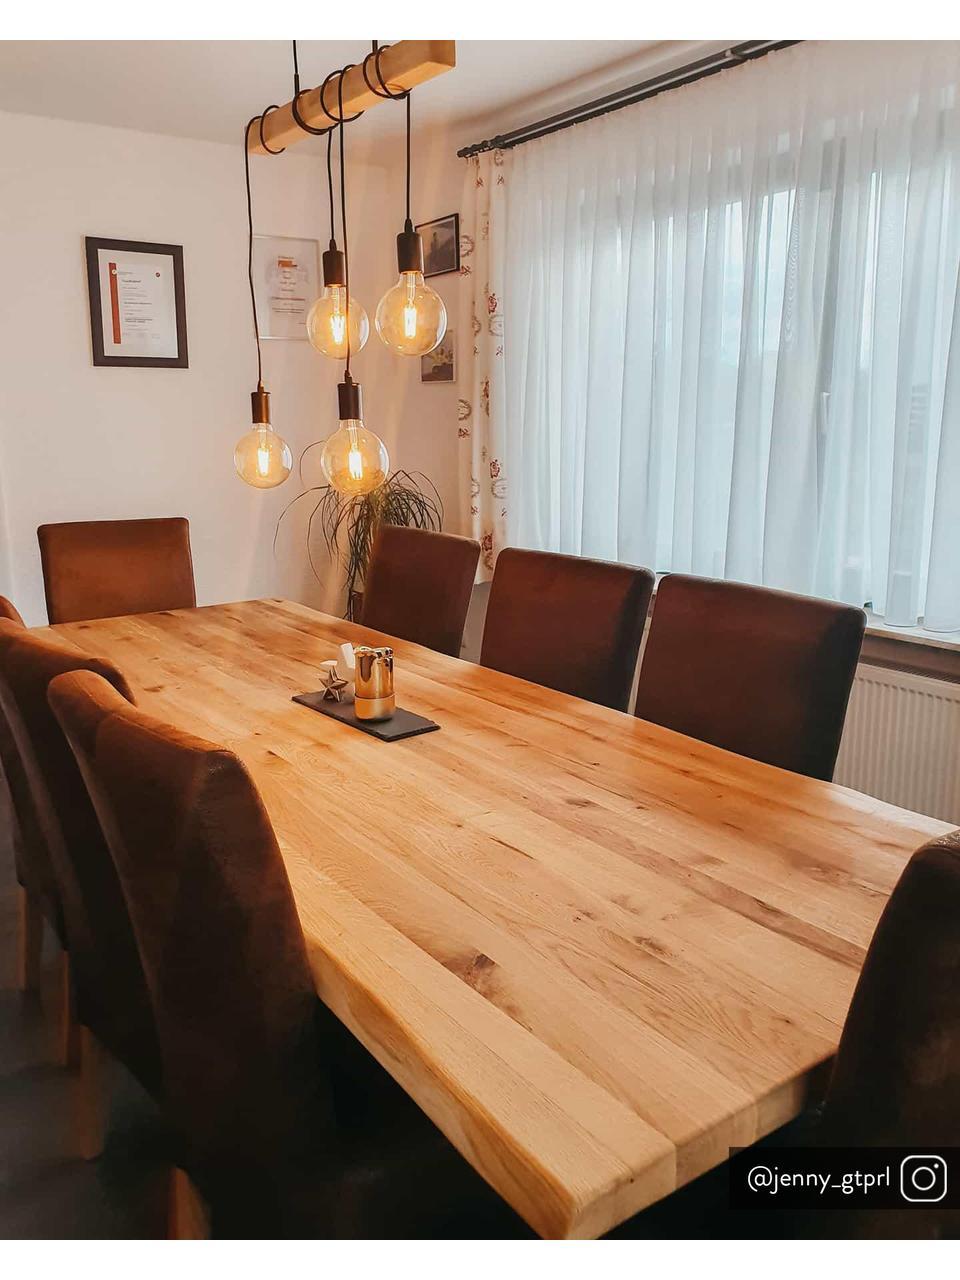 Pendelleuchte Townshend aus Holz, Schwarz, Holz, 70 x 110 cm